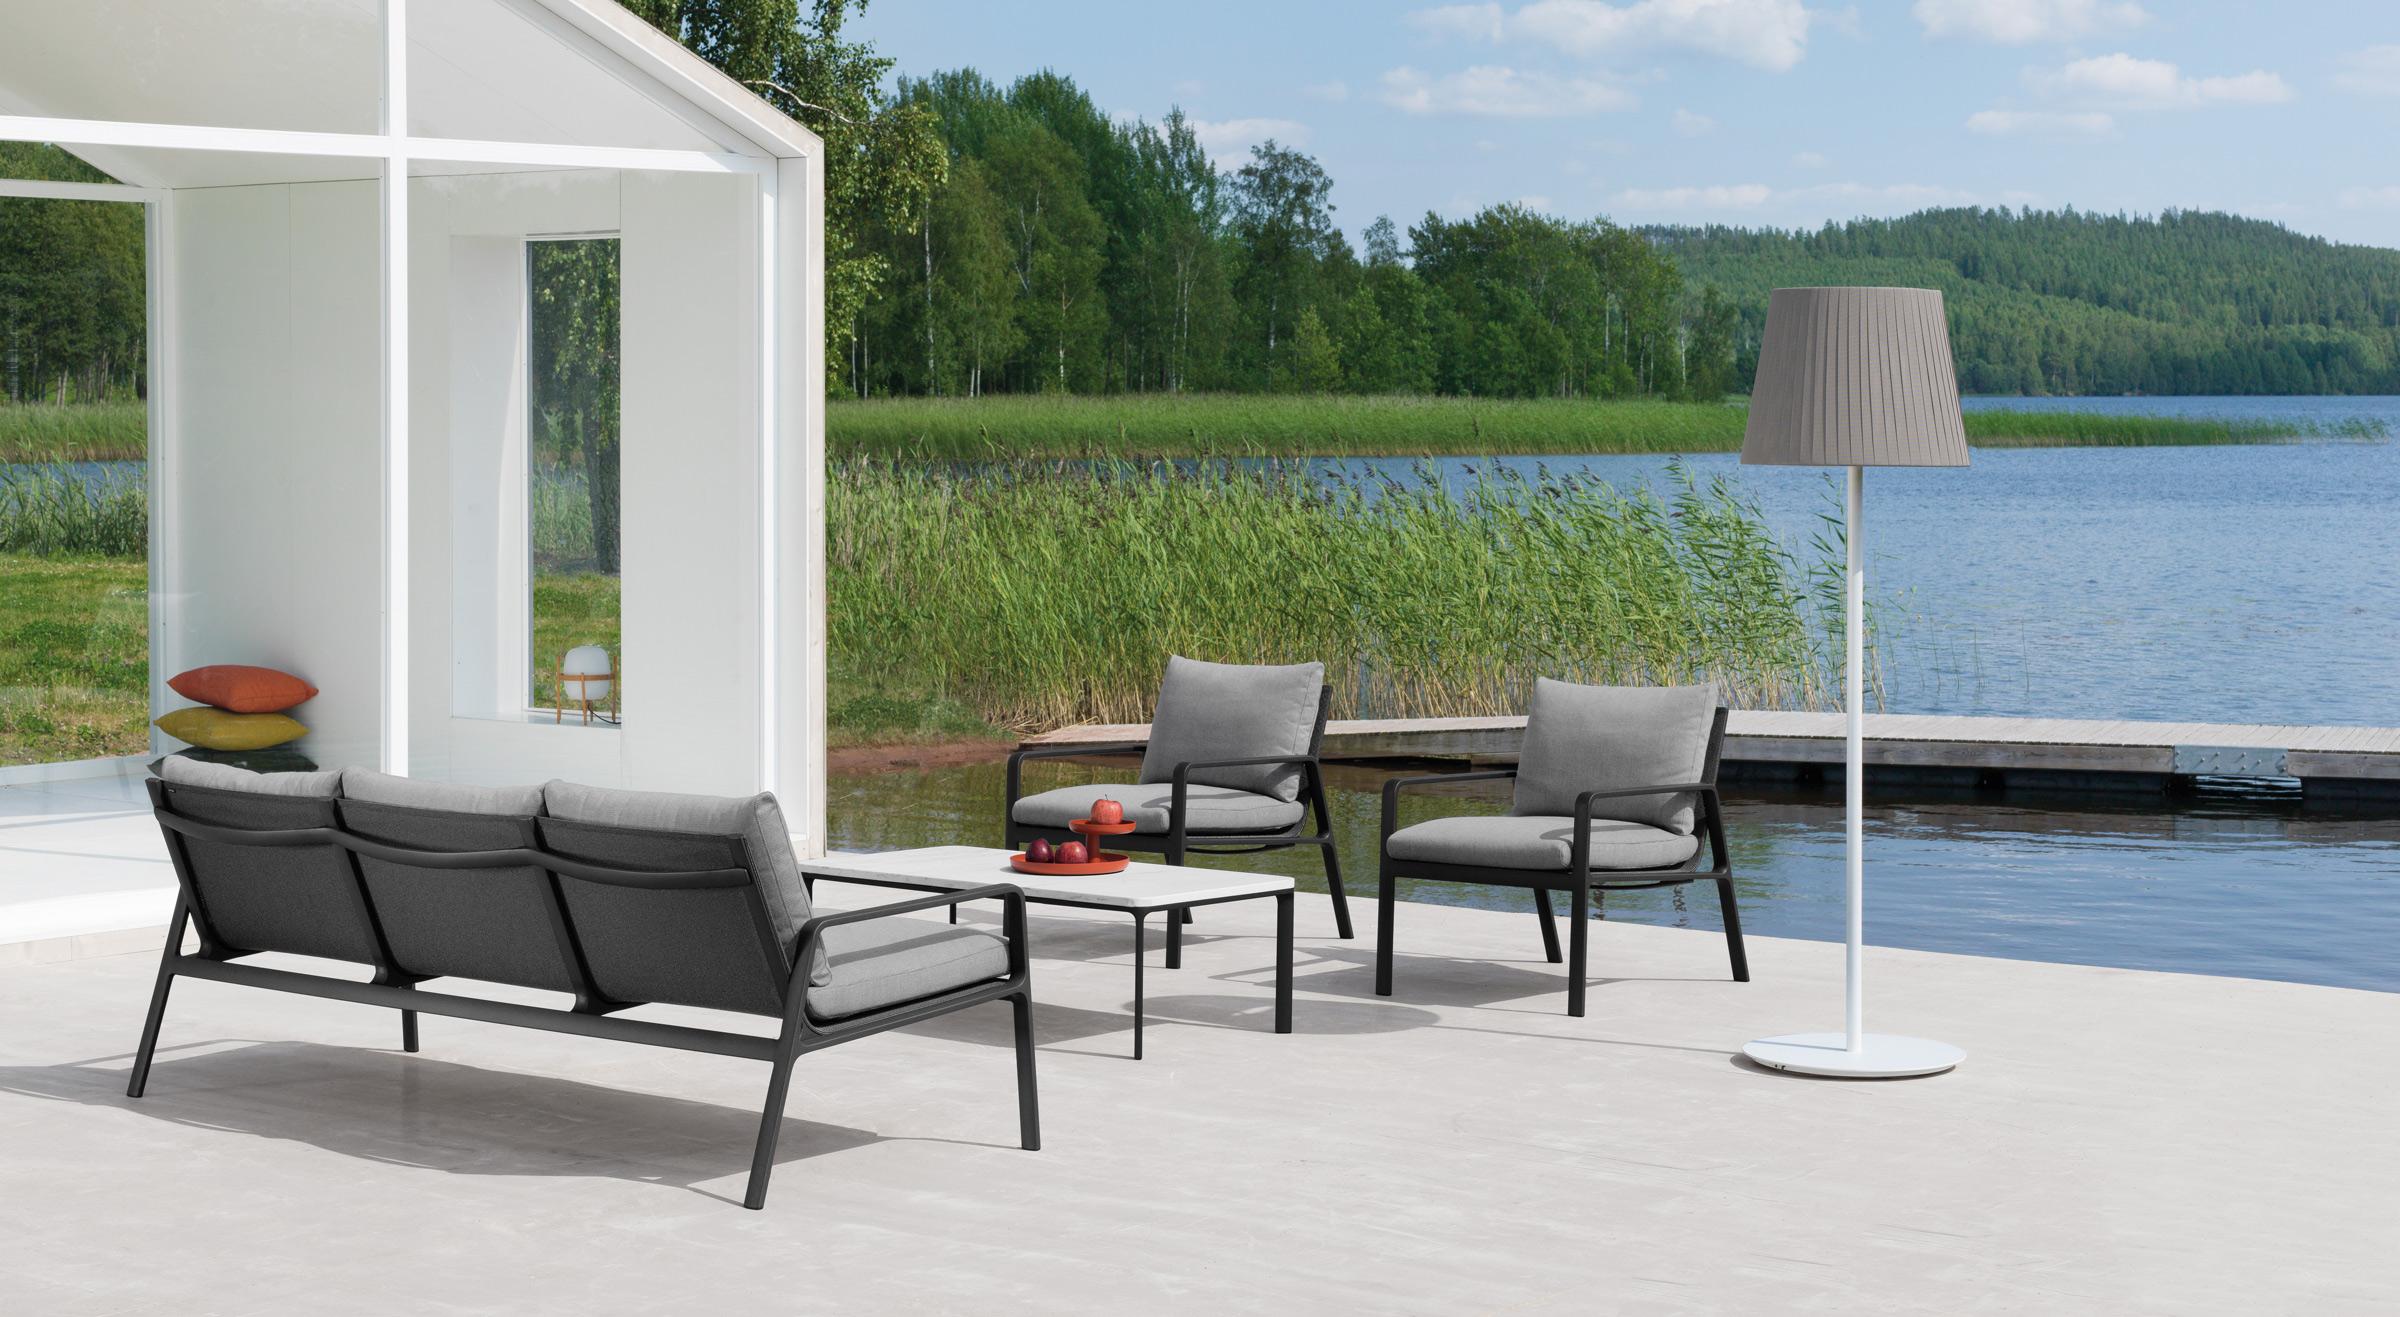 Arredamento outdoor kettal for Arredamento outdoor design